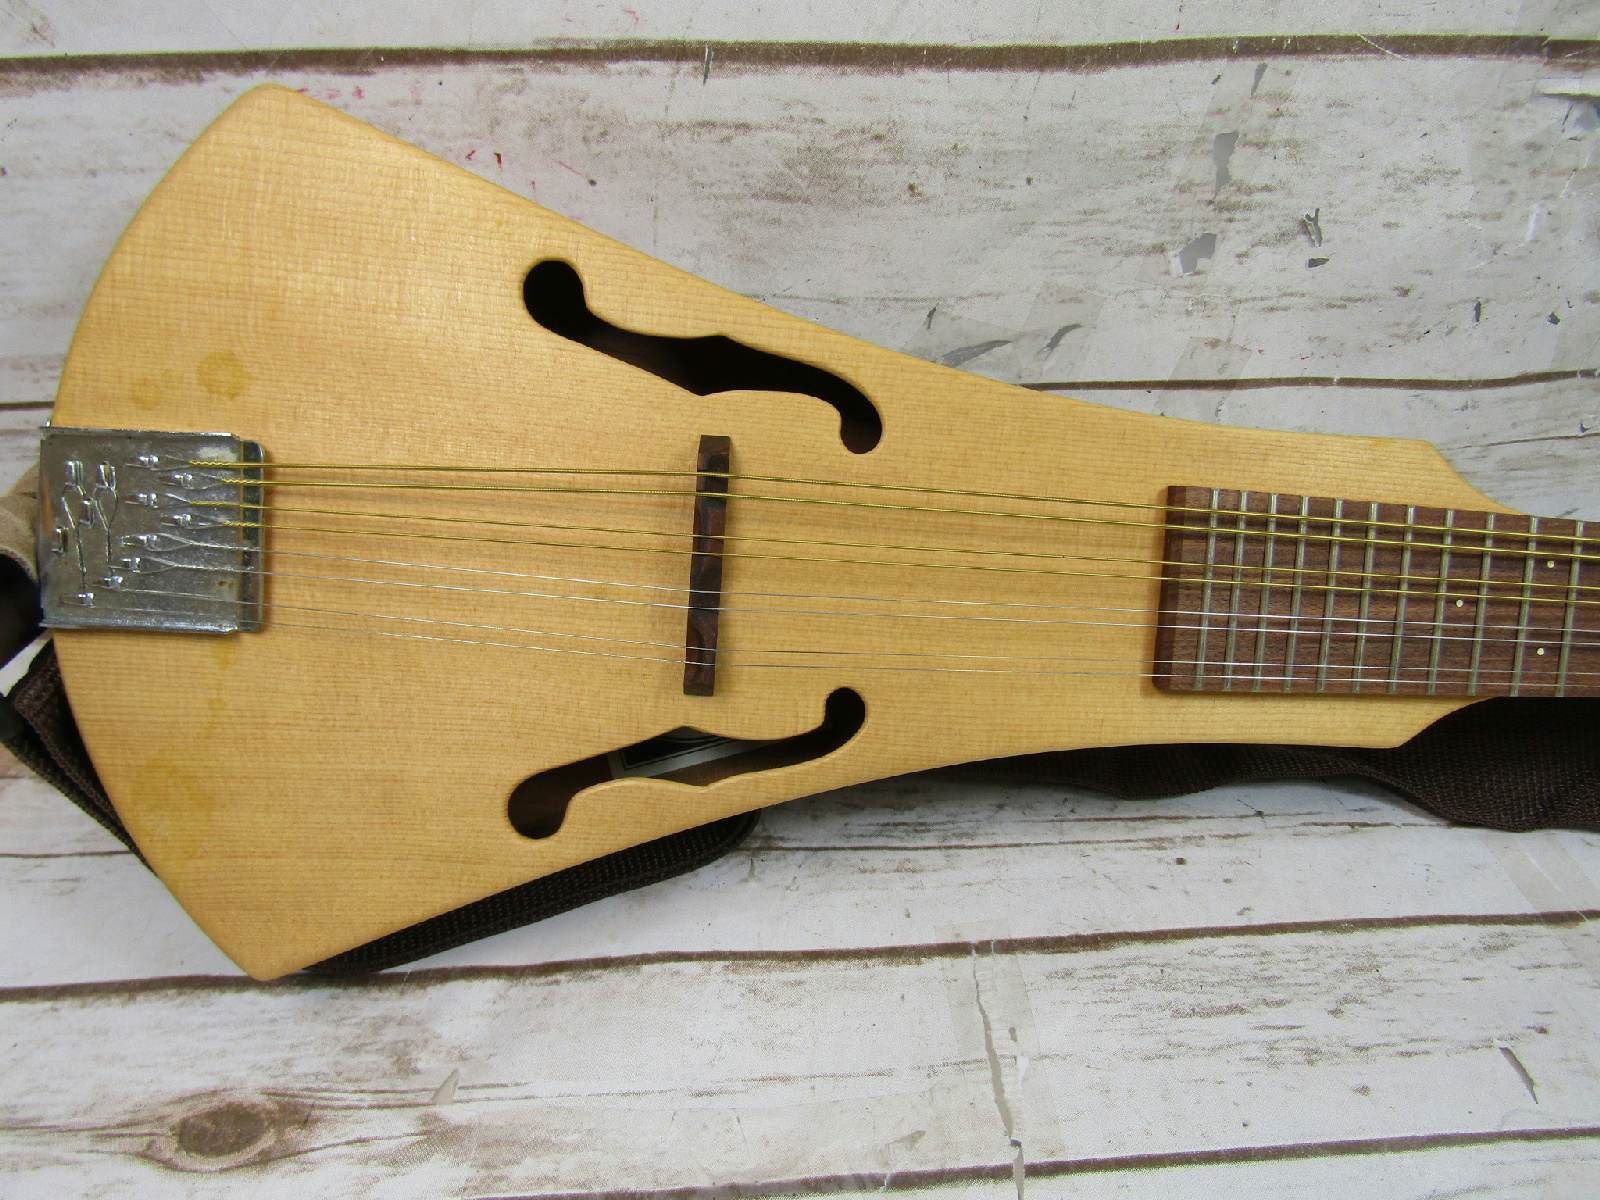 martin and company 8 string backpacker 39 s mandolin in soft bag ebay. Black Bedroom Furniture Sets. Home Design Ideas